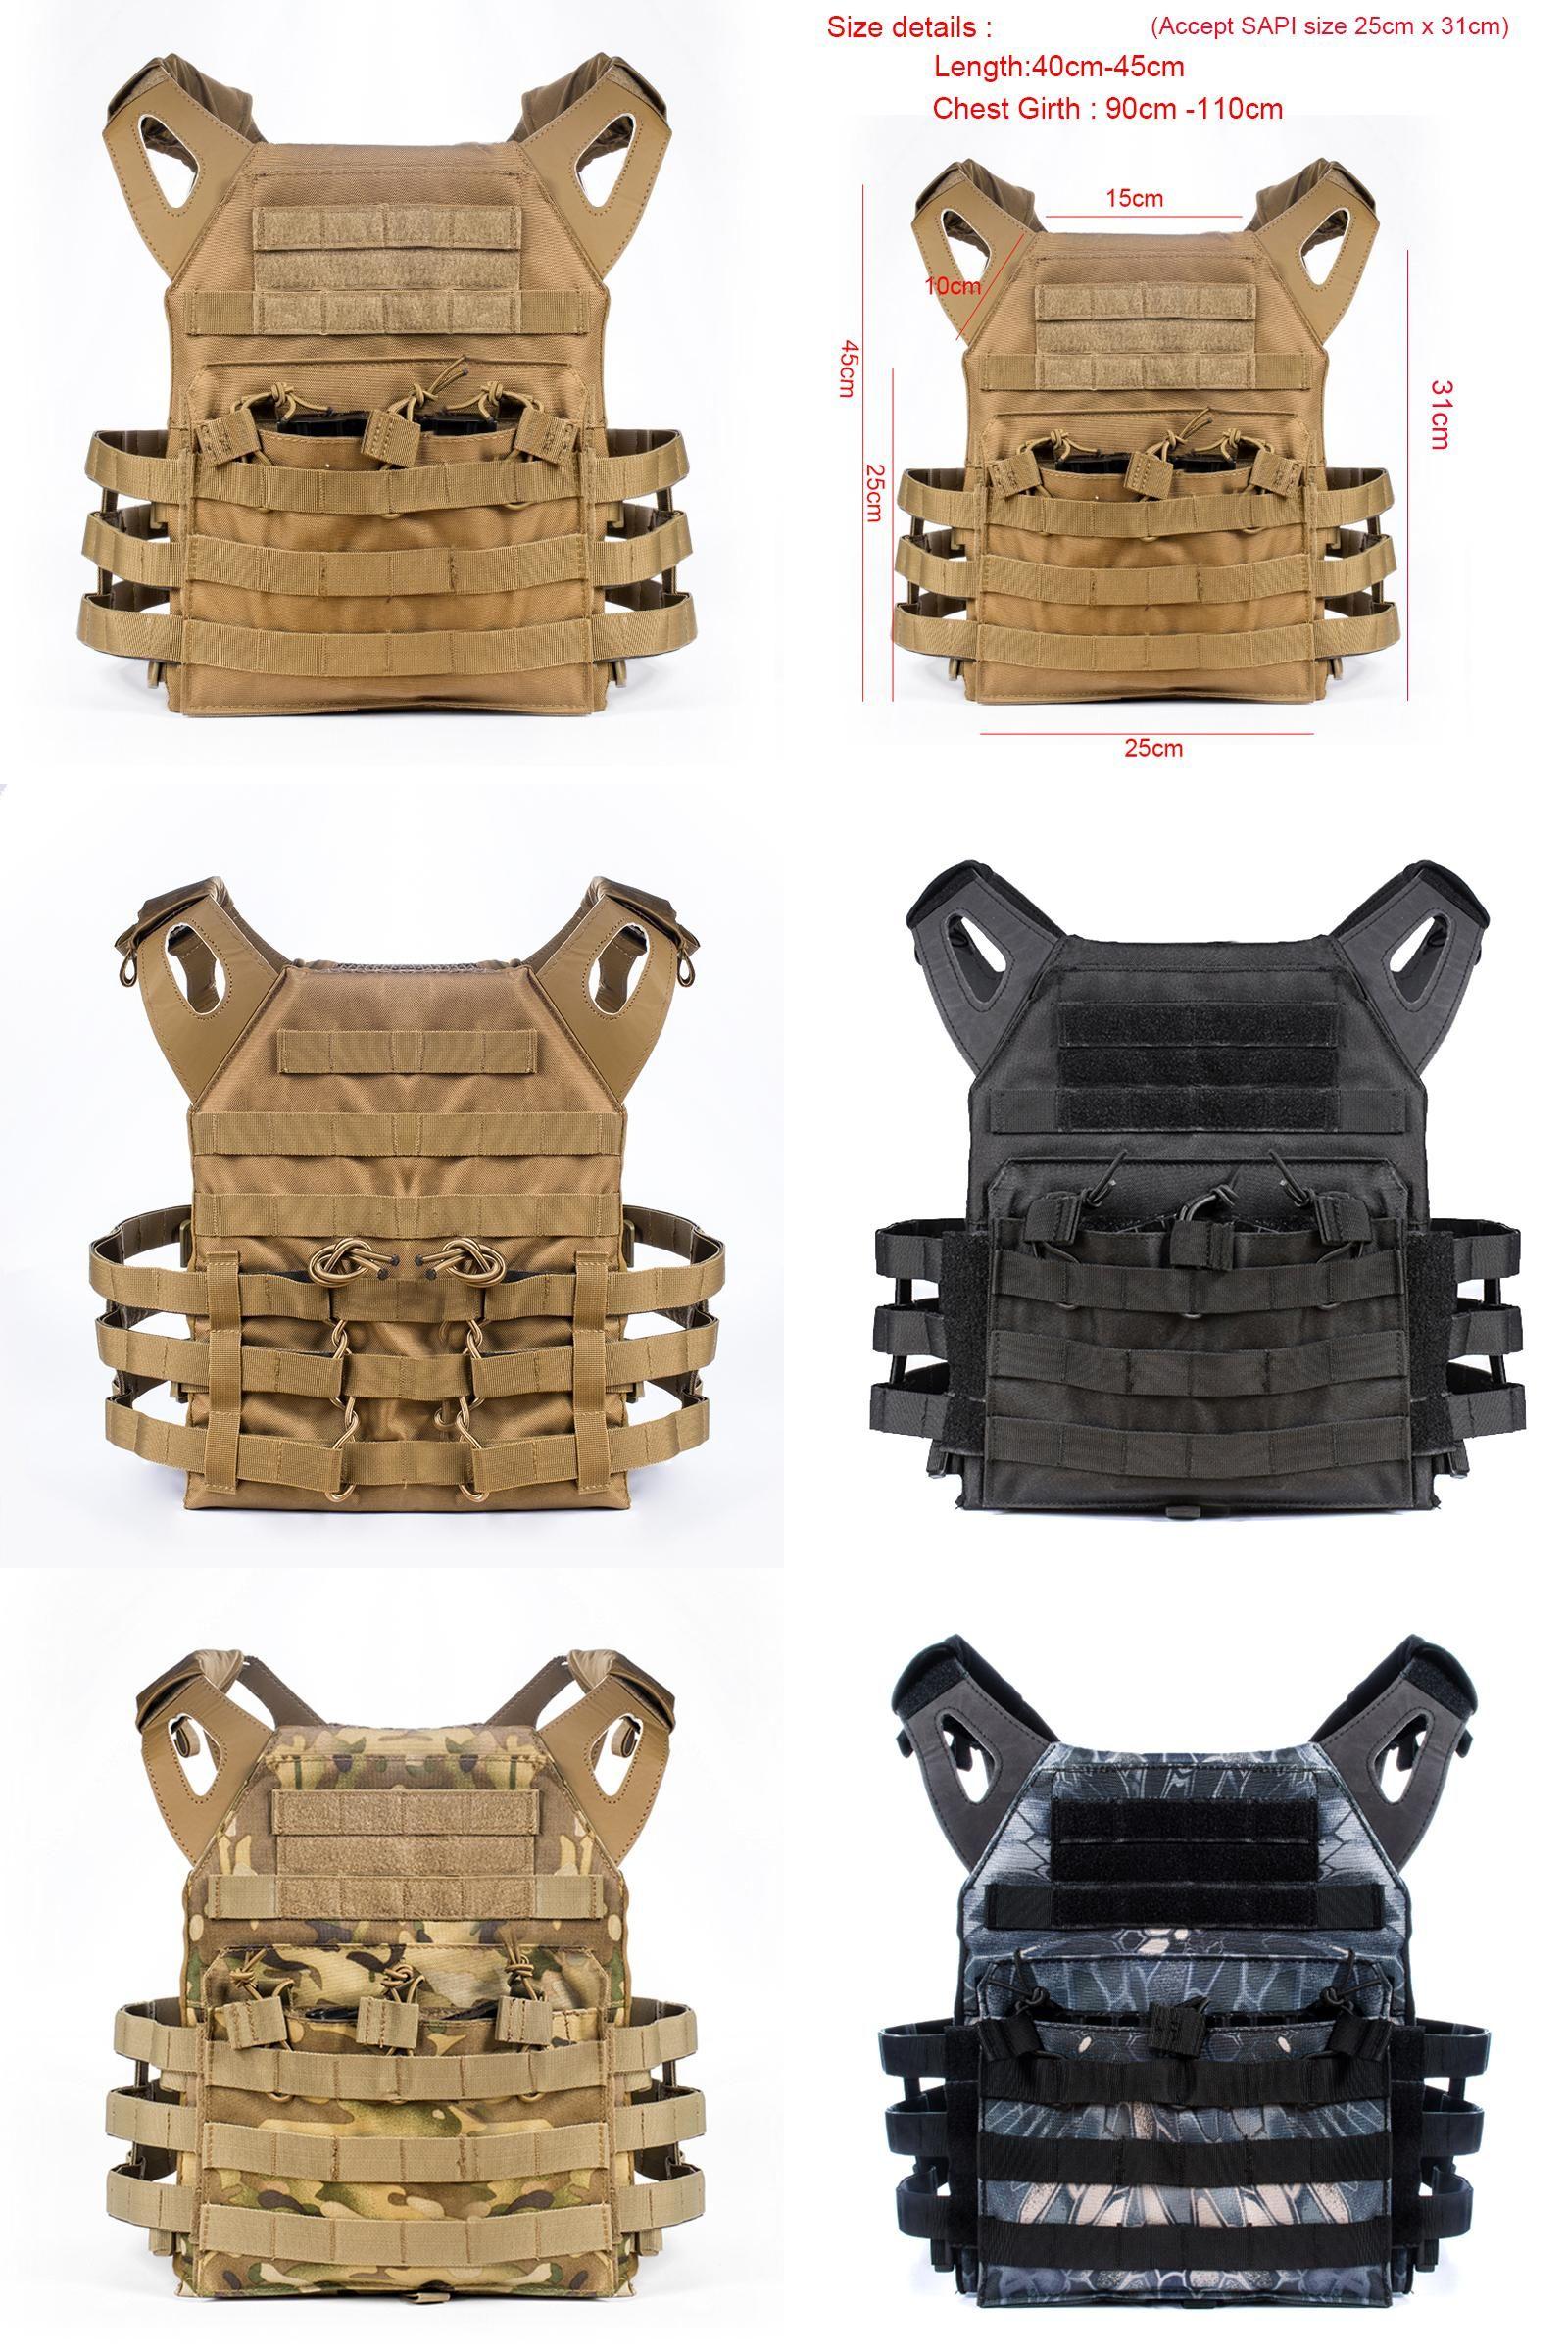 Military Armor Tactical JPC Vests Combat Army Vest Plate Carrier Men Vests USA